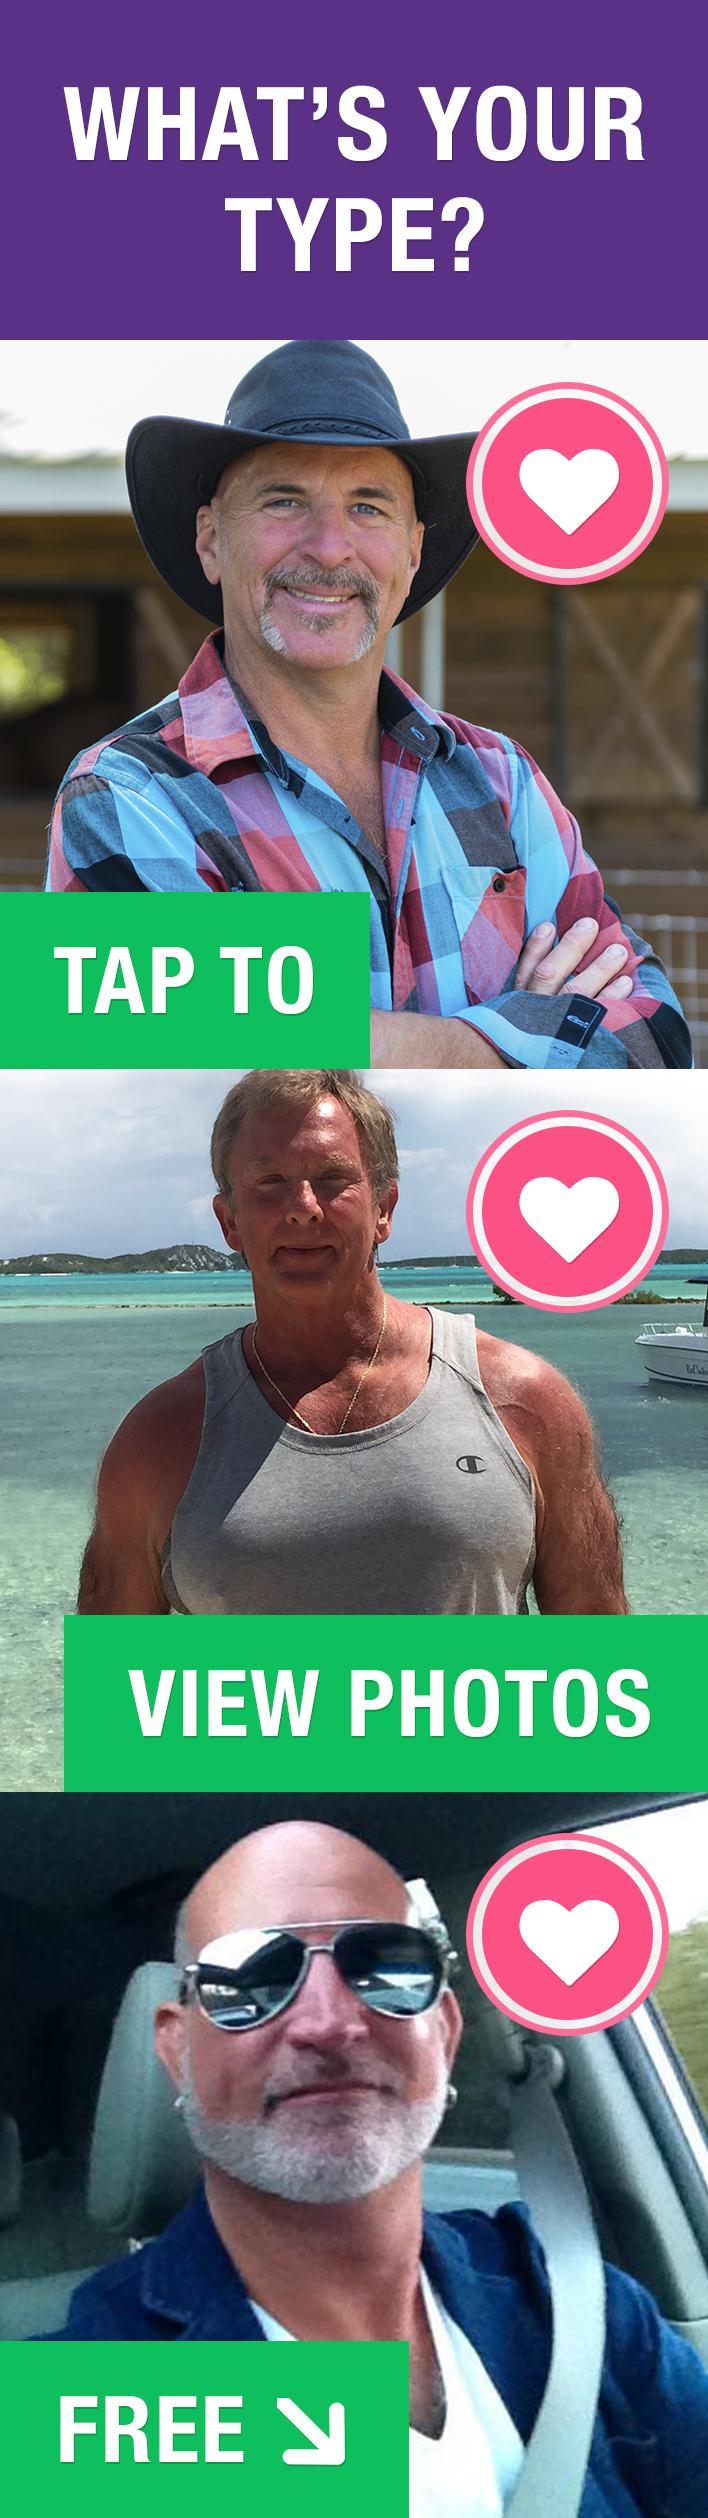 best gay dating app iphone